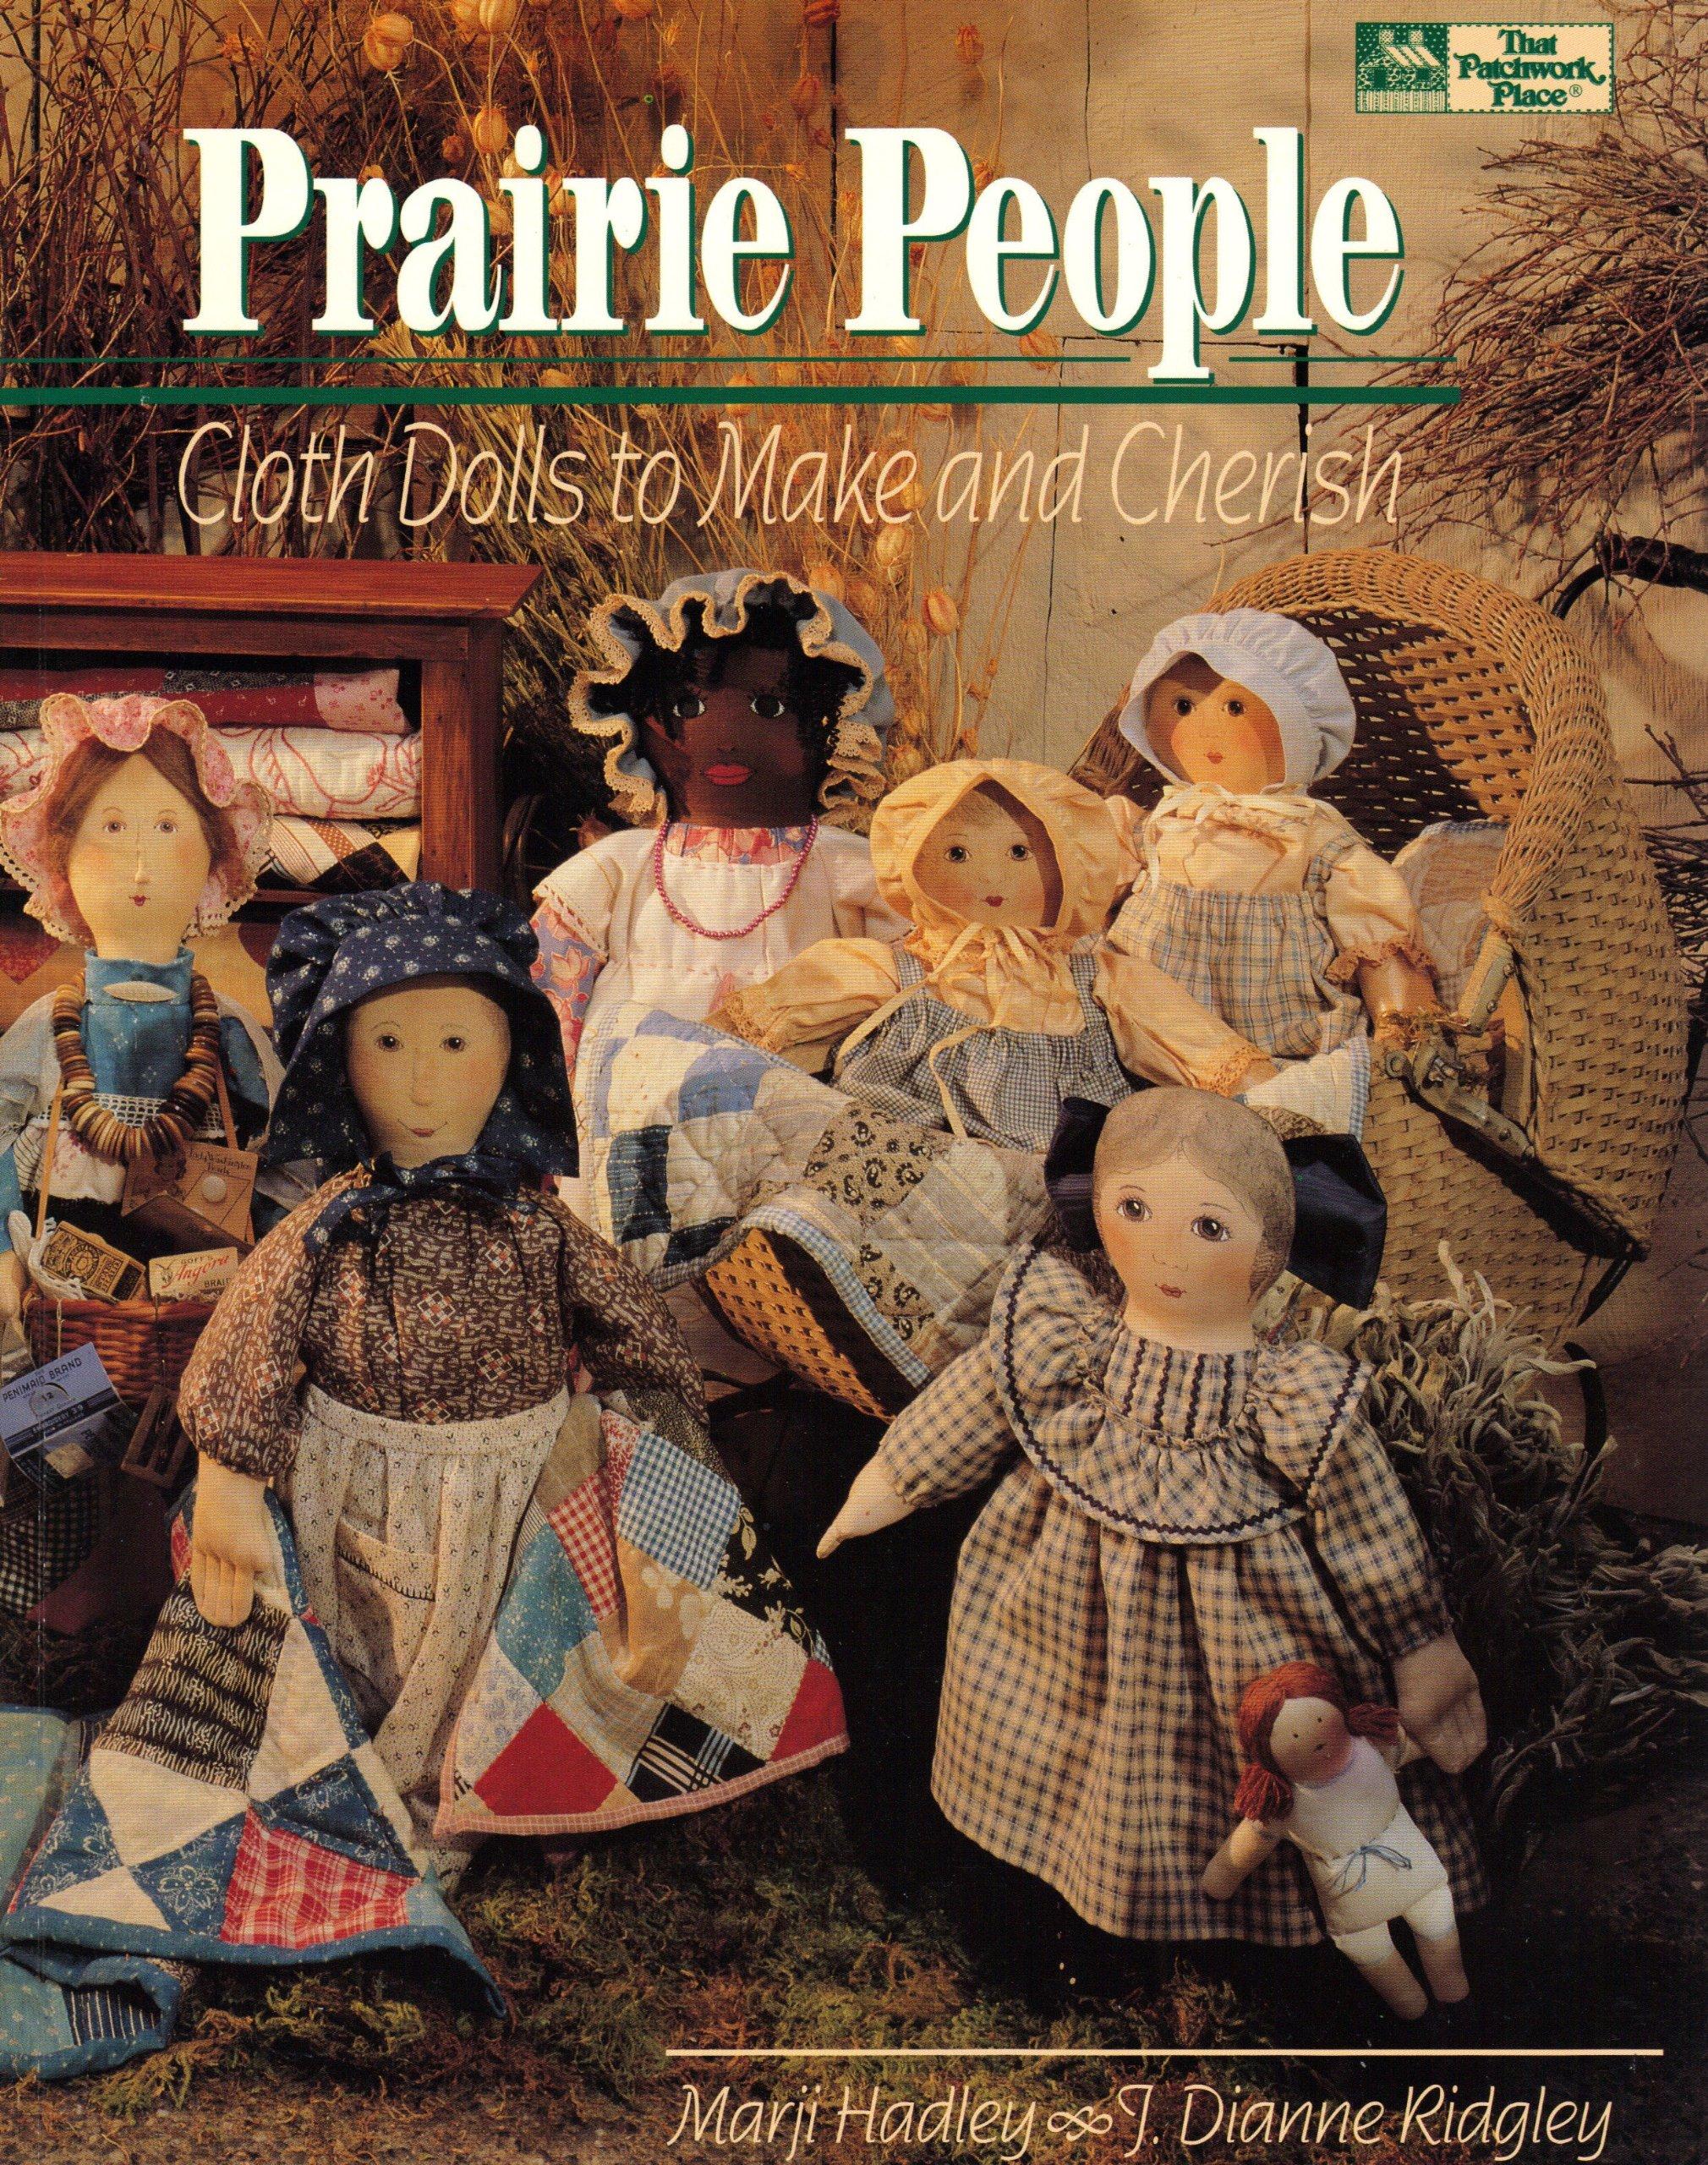 How To Make A Book Cover Cloth ~ Prairie people cloth dolls to make and cherish marji hadley j